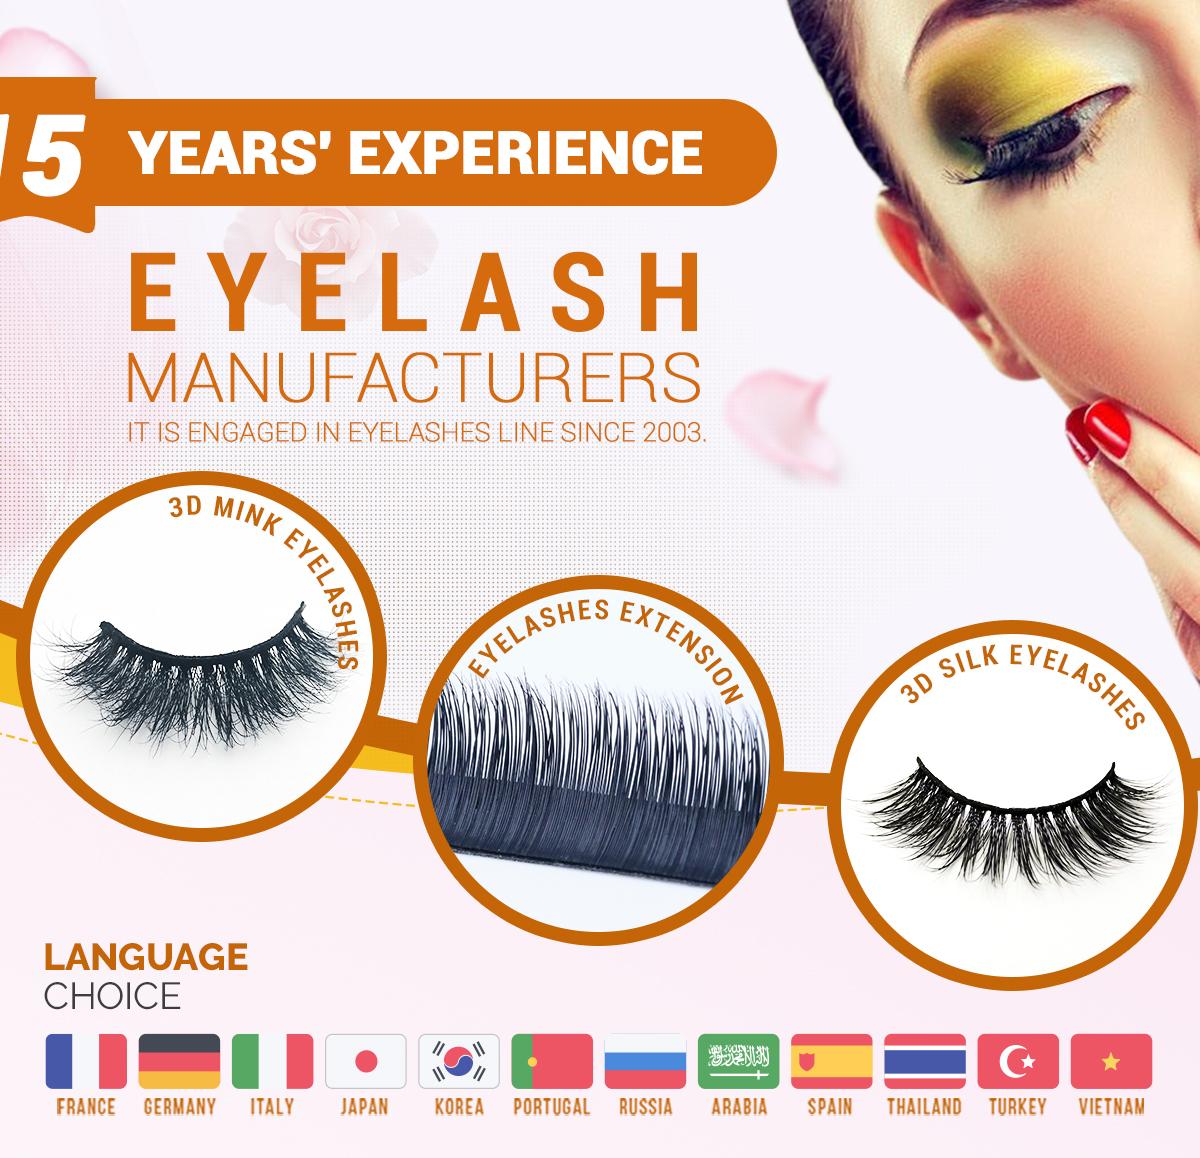 Beauty Essentials Beauty & Health Wholesalemink False Eyelashes 3d Mink Lashes Volume Eyelash Extension Beauty Personal Care Custom Eyelash Packaging China Vendor